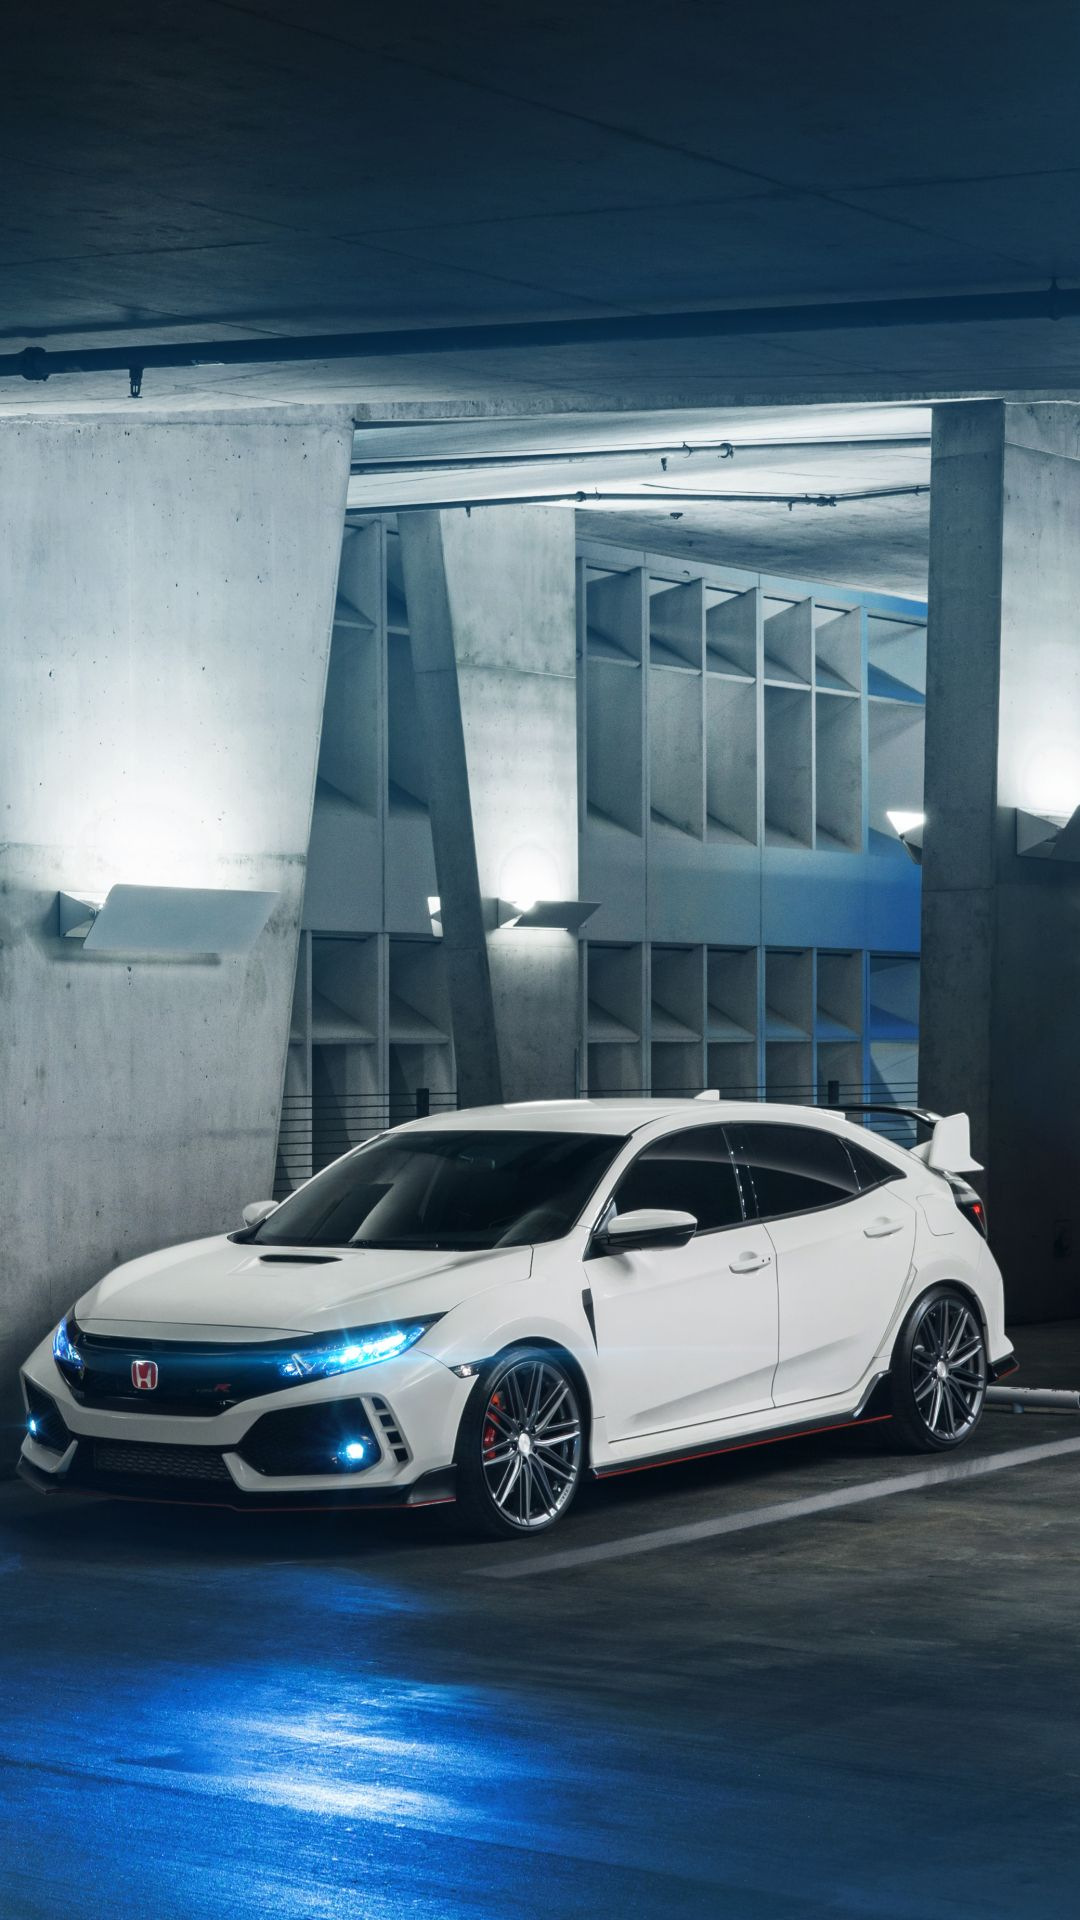 Vehicles Honda Civic Type R 1080x1920 Mobile Wallpaper Honda Civic Type R Honda Civic New Car Accessories